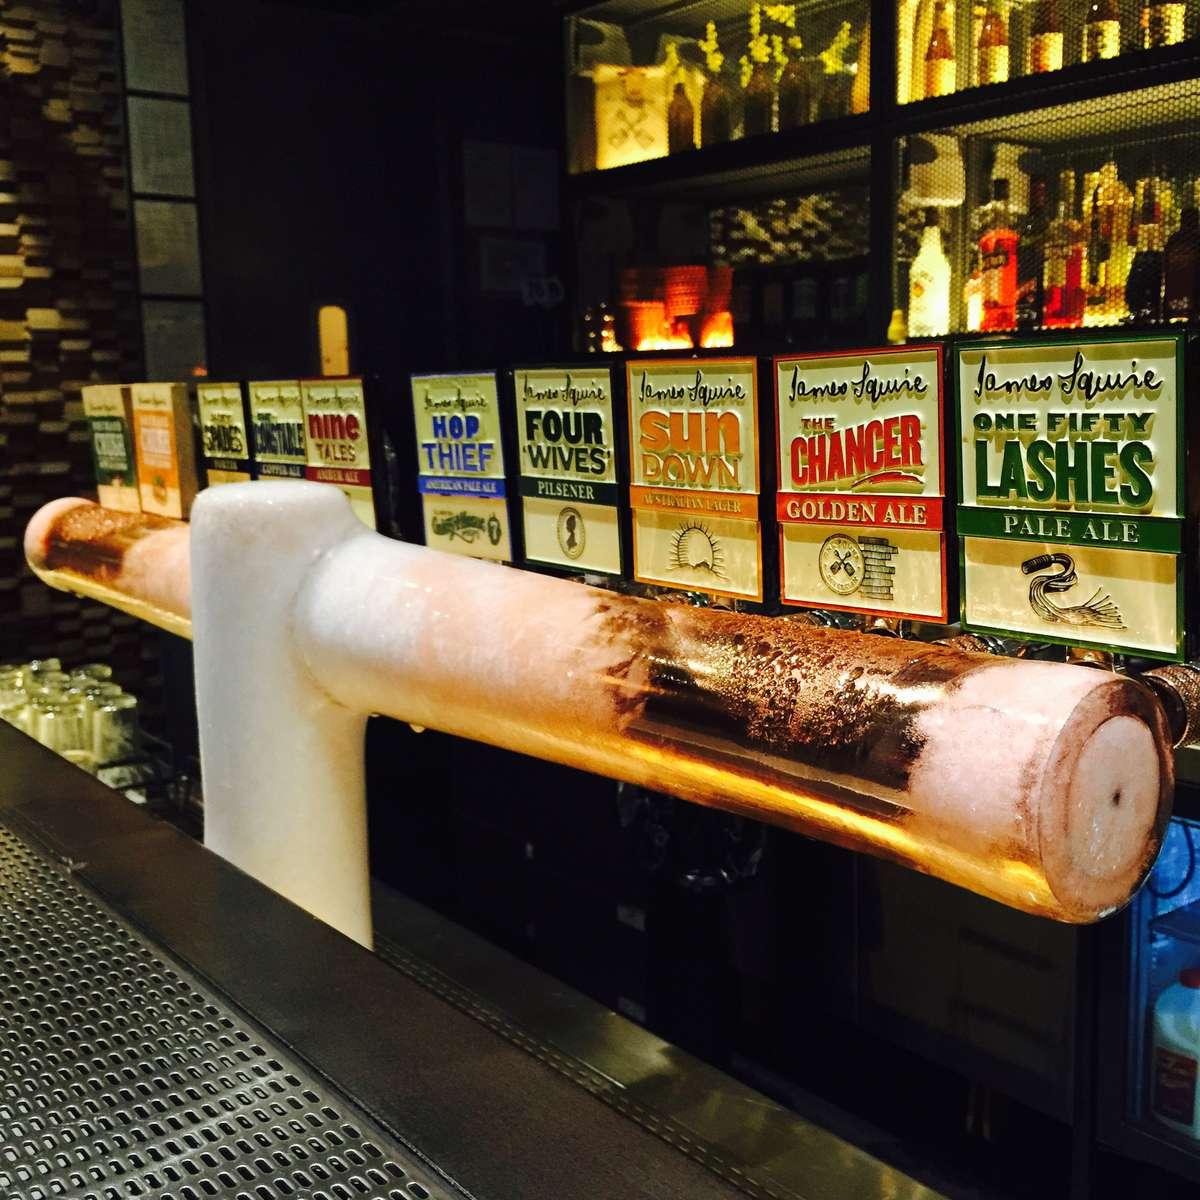 James Squire beers ciders